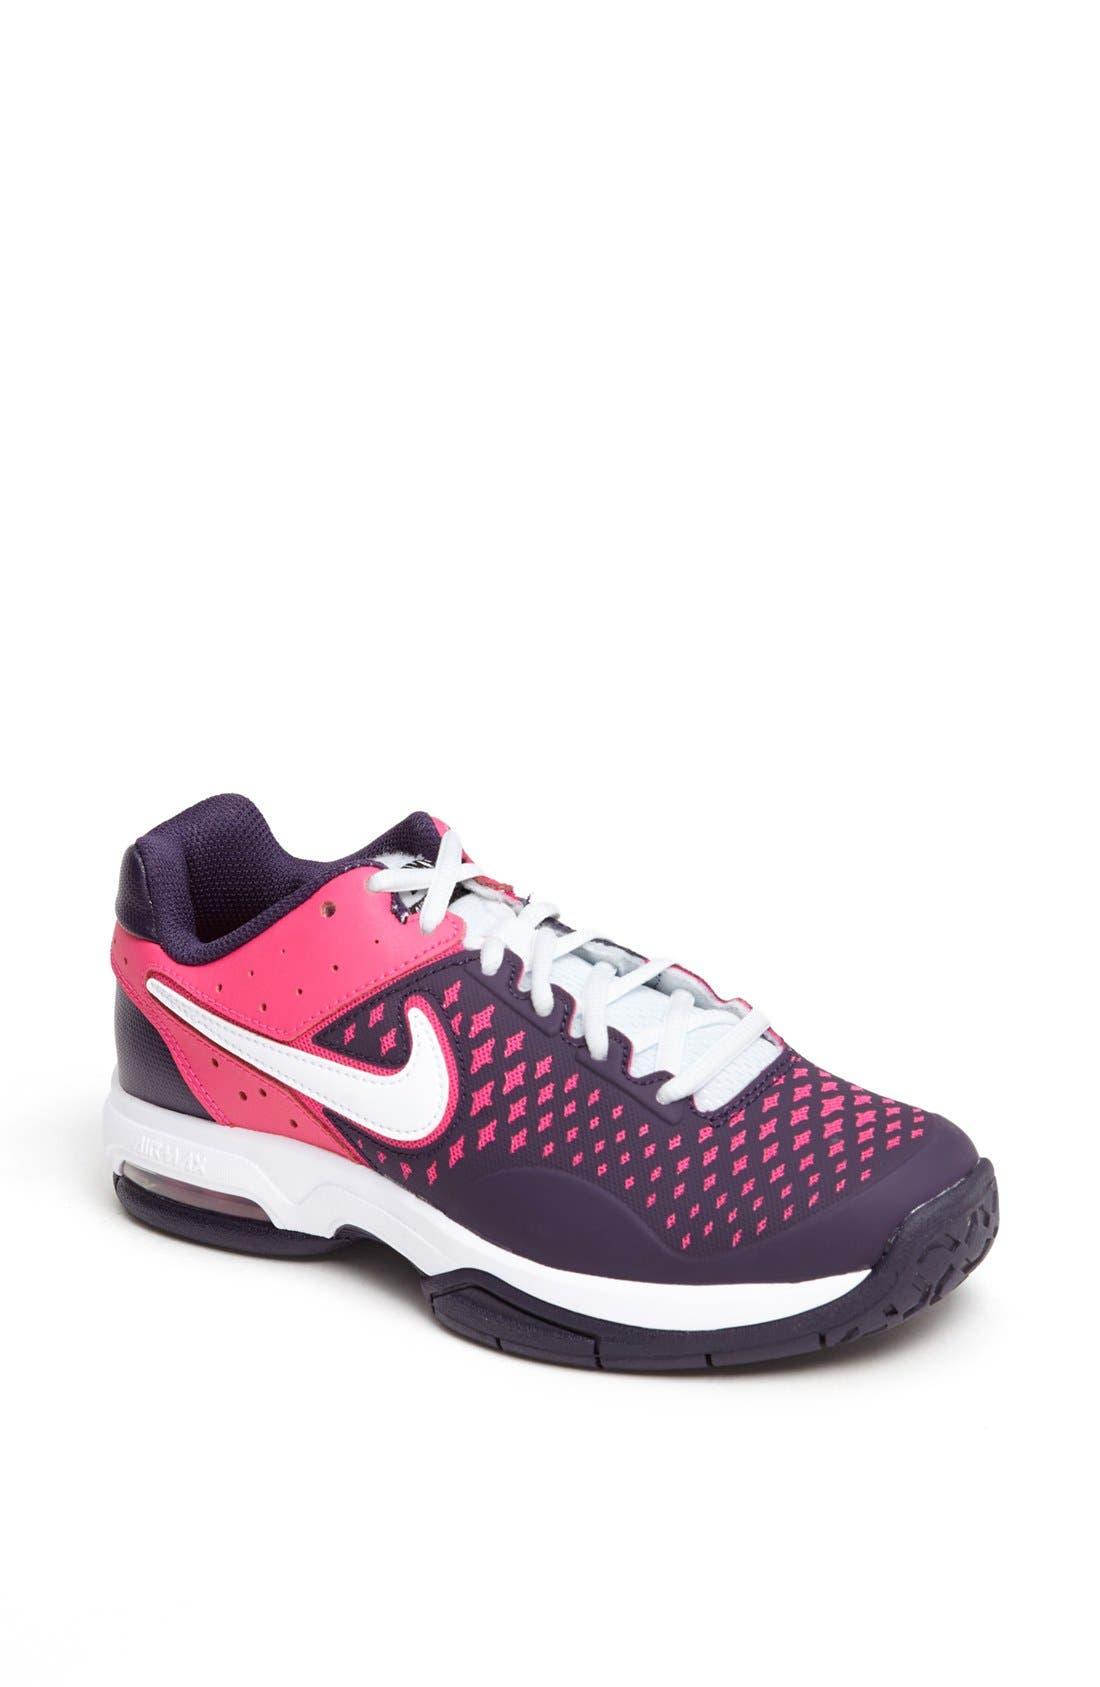 Main Image - Nike 'Air Cage Advantage' Tennis Shoe (Women)